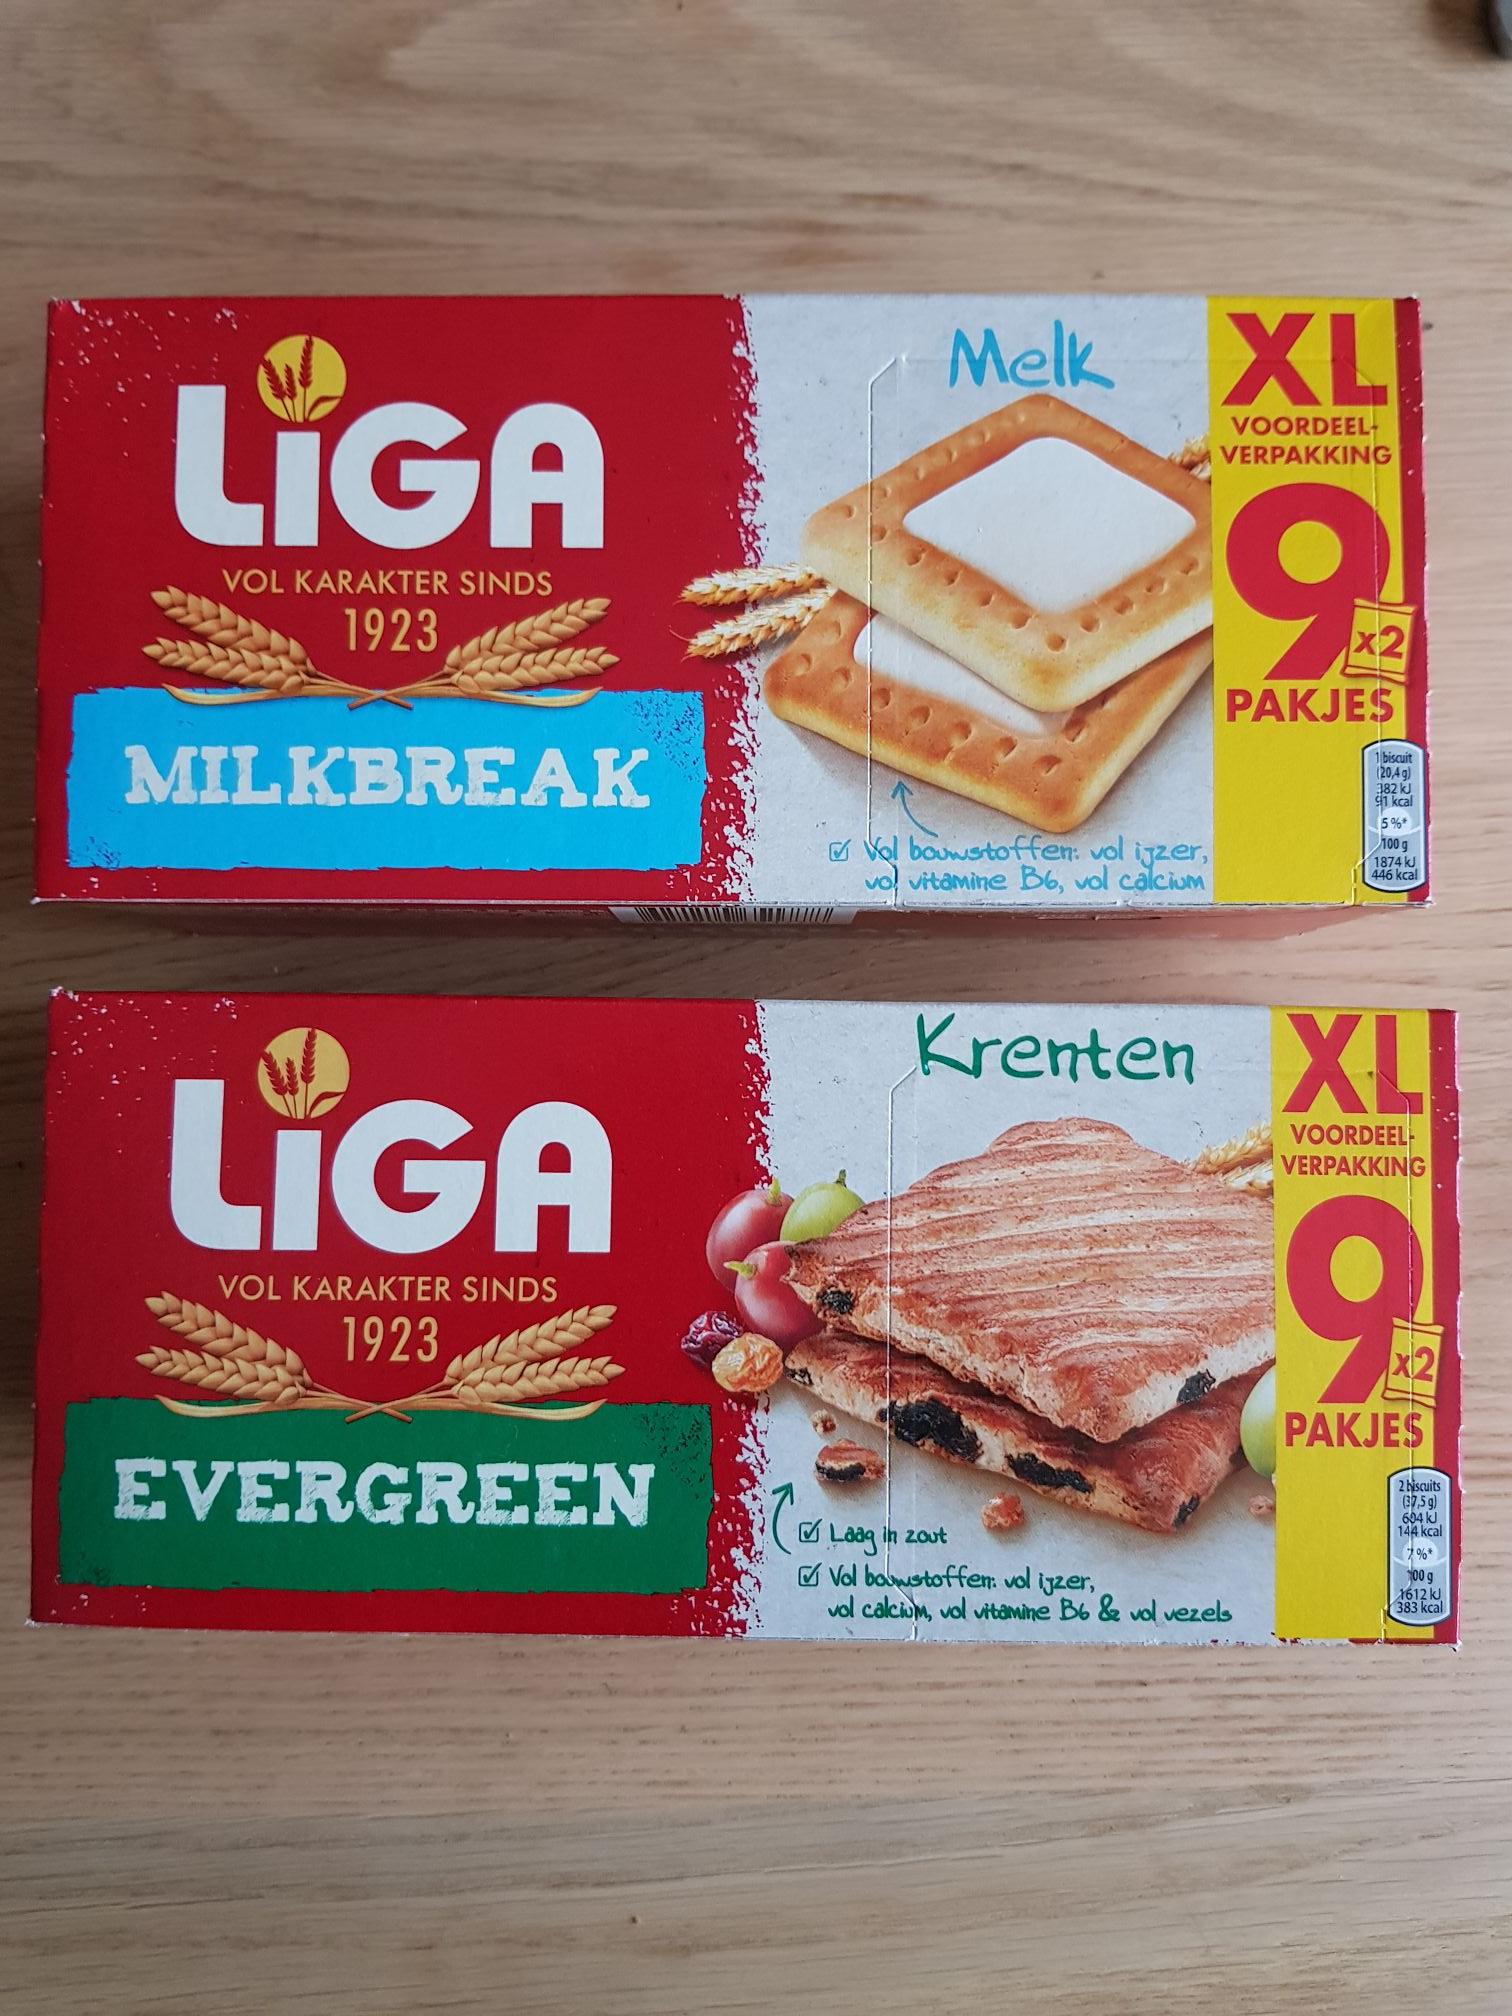 Liga Evergreen of Milkbreak, 9 stuks 1 euro!